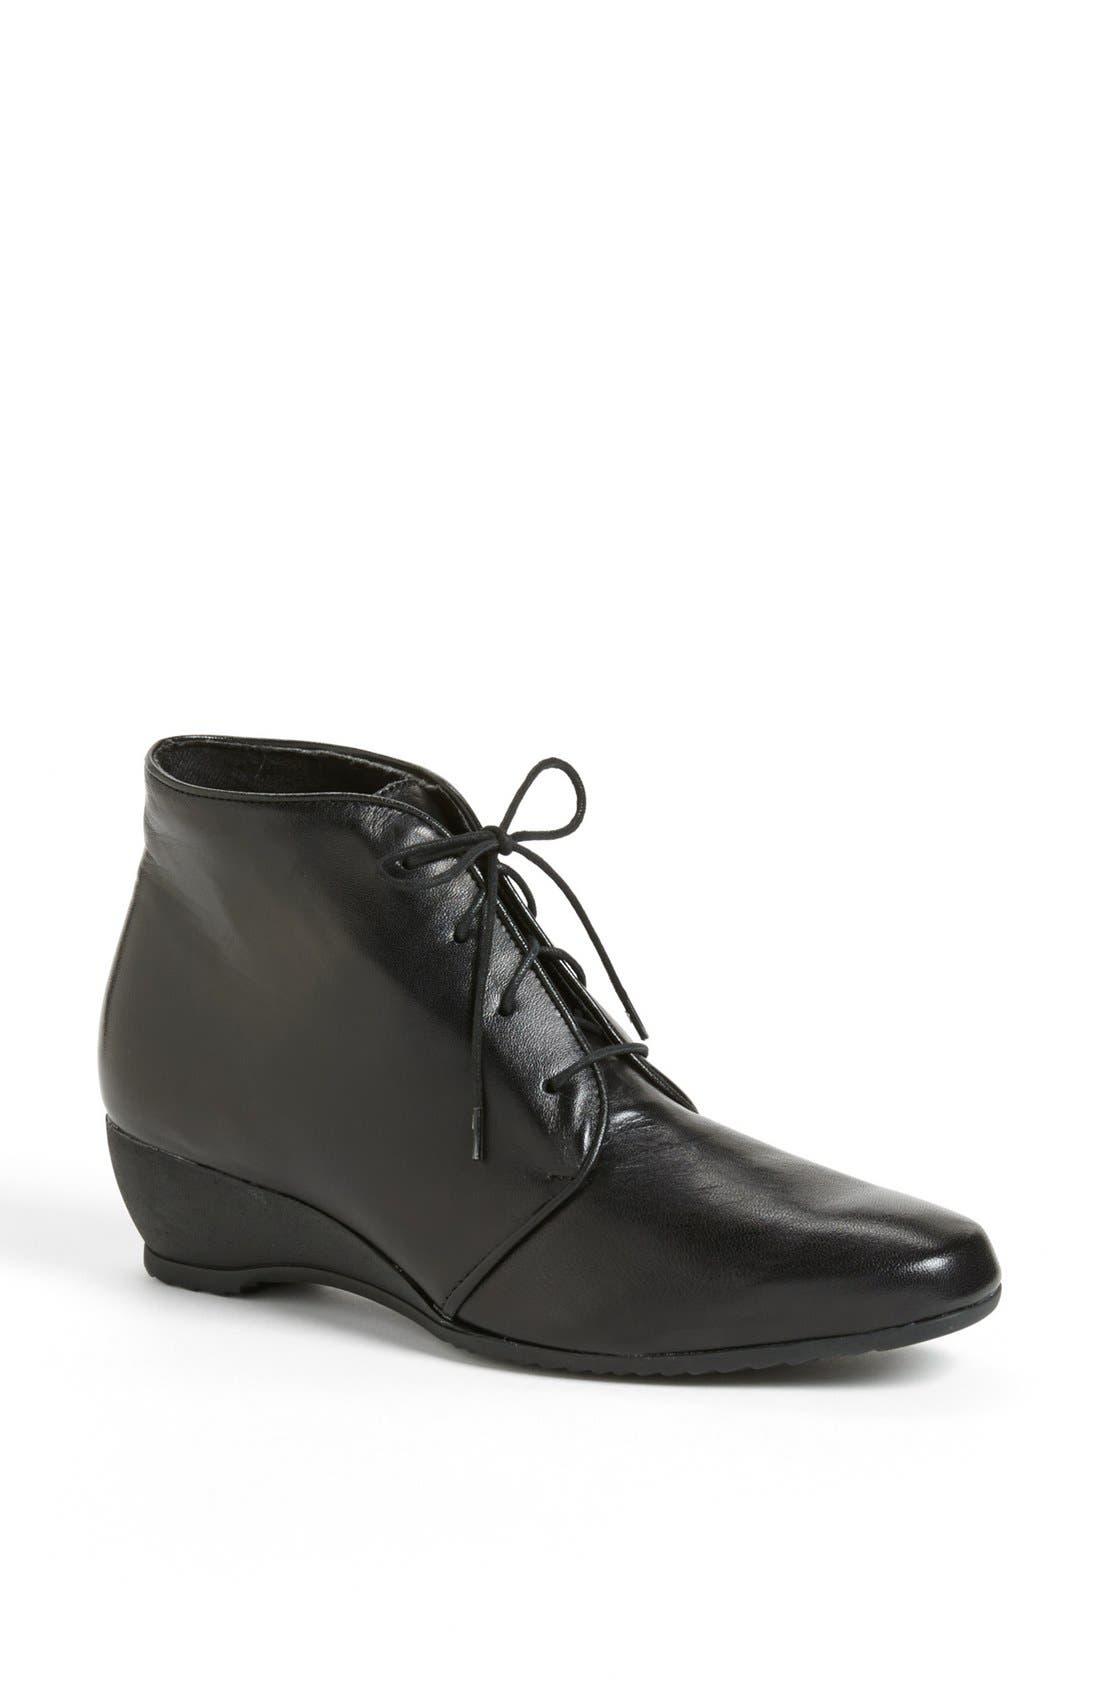 Main Image - Munro 'Kara' Boot